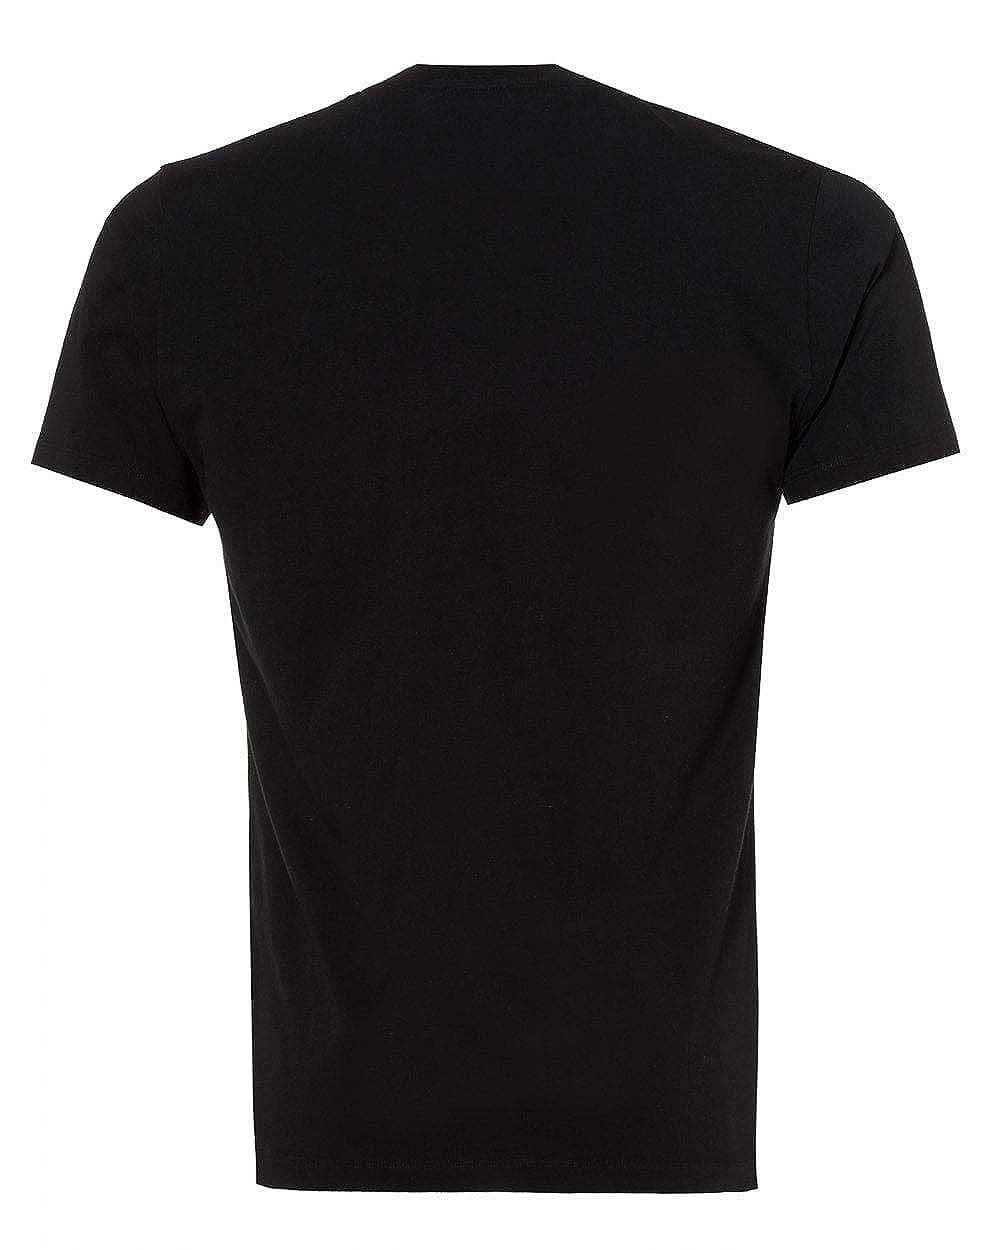 4cecdf31 Kenzo Mens Eye T-Shirt Black: Amazon.co.uk: Clothing